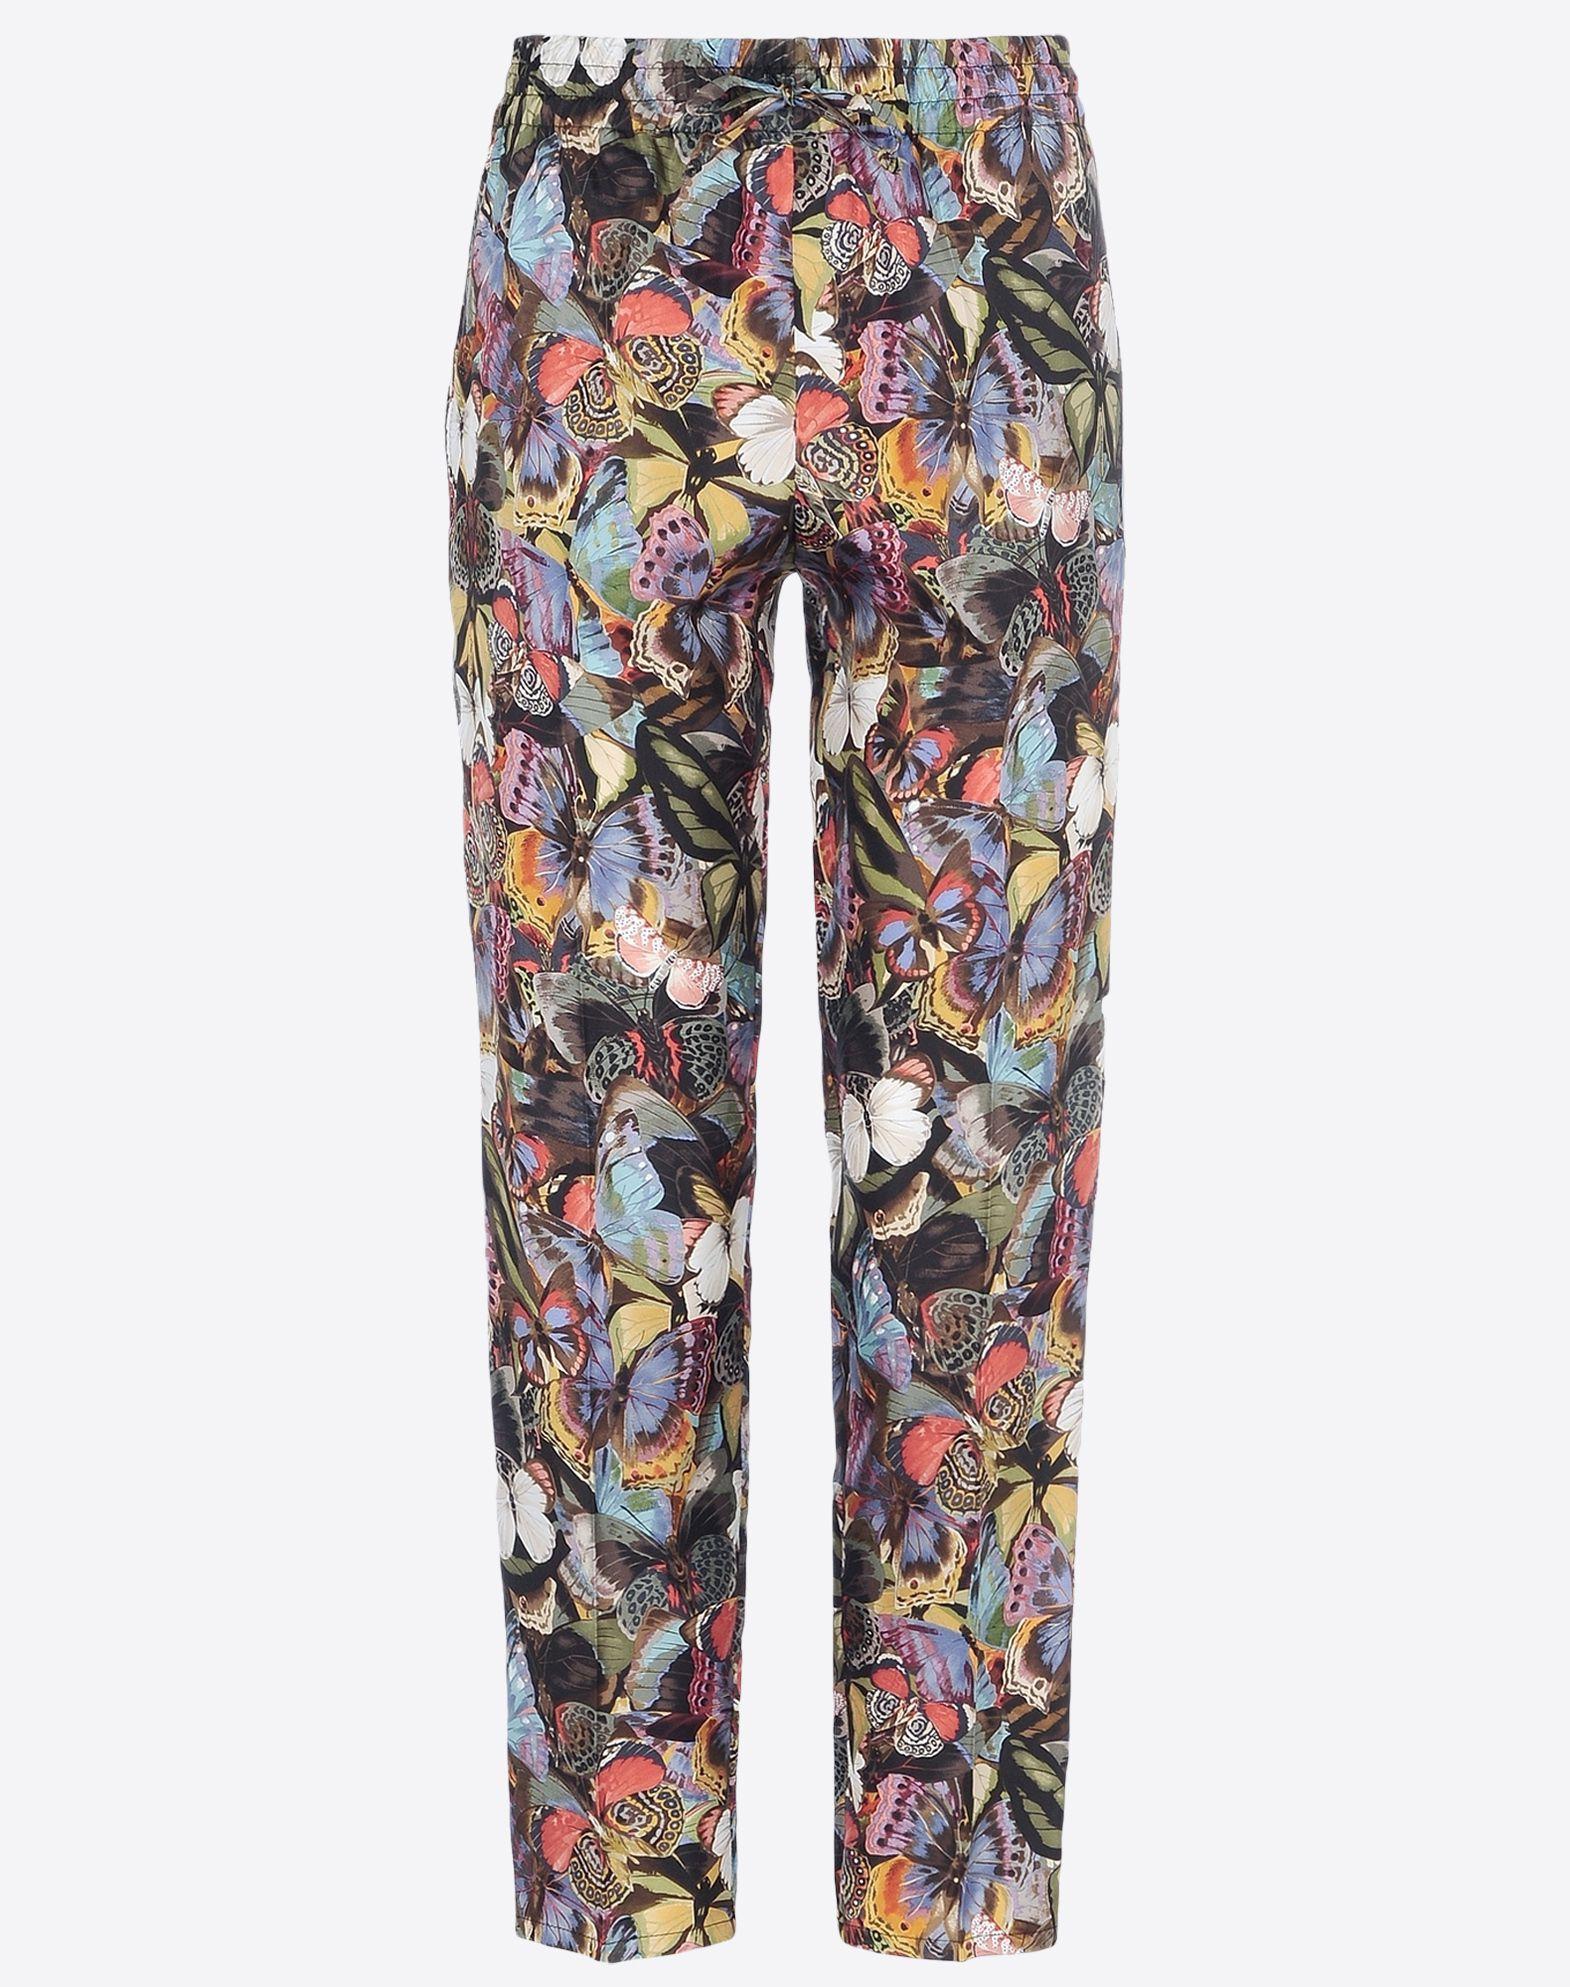 VALENTINO HBC65180-VL0881B M00 Skirts and Pants D d